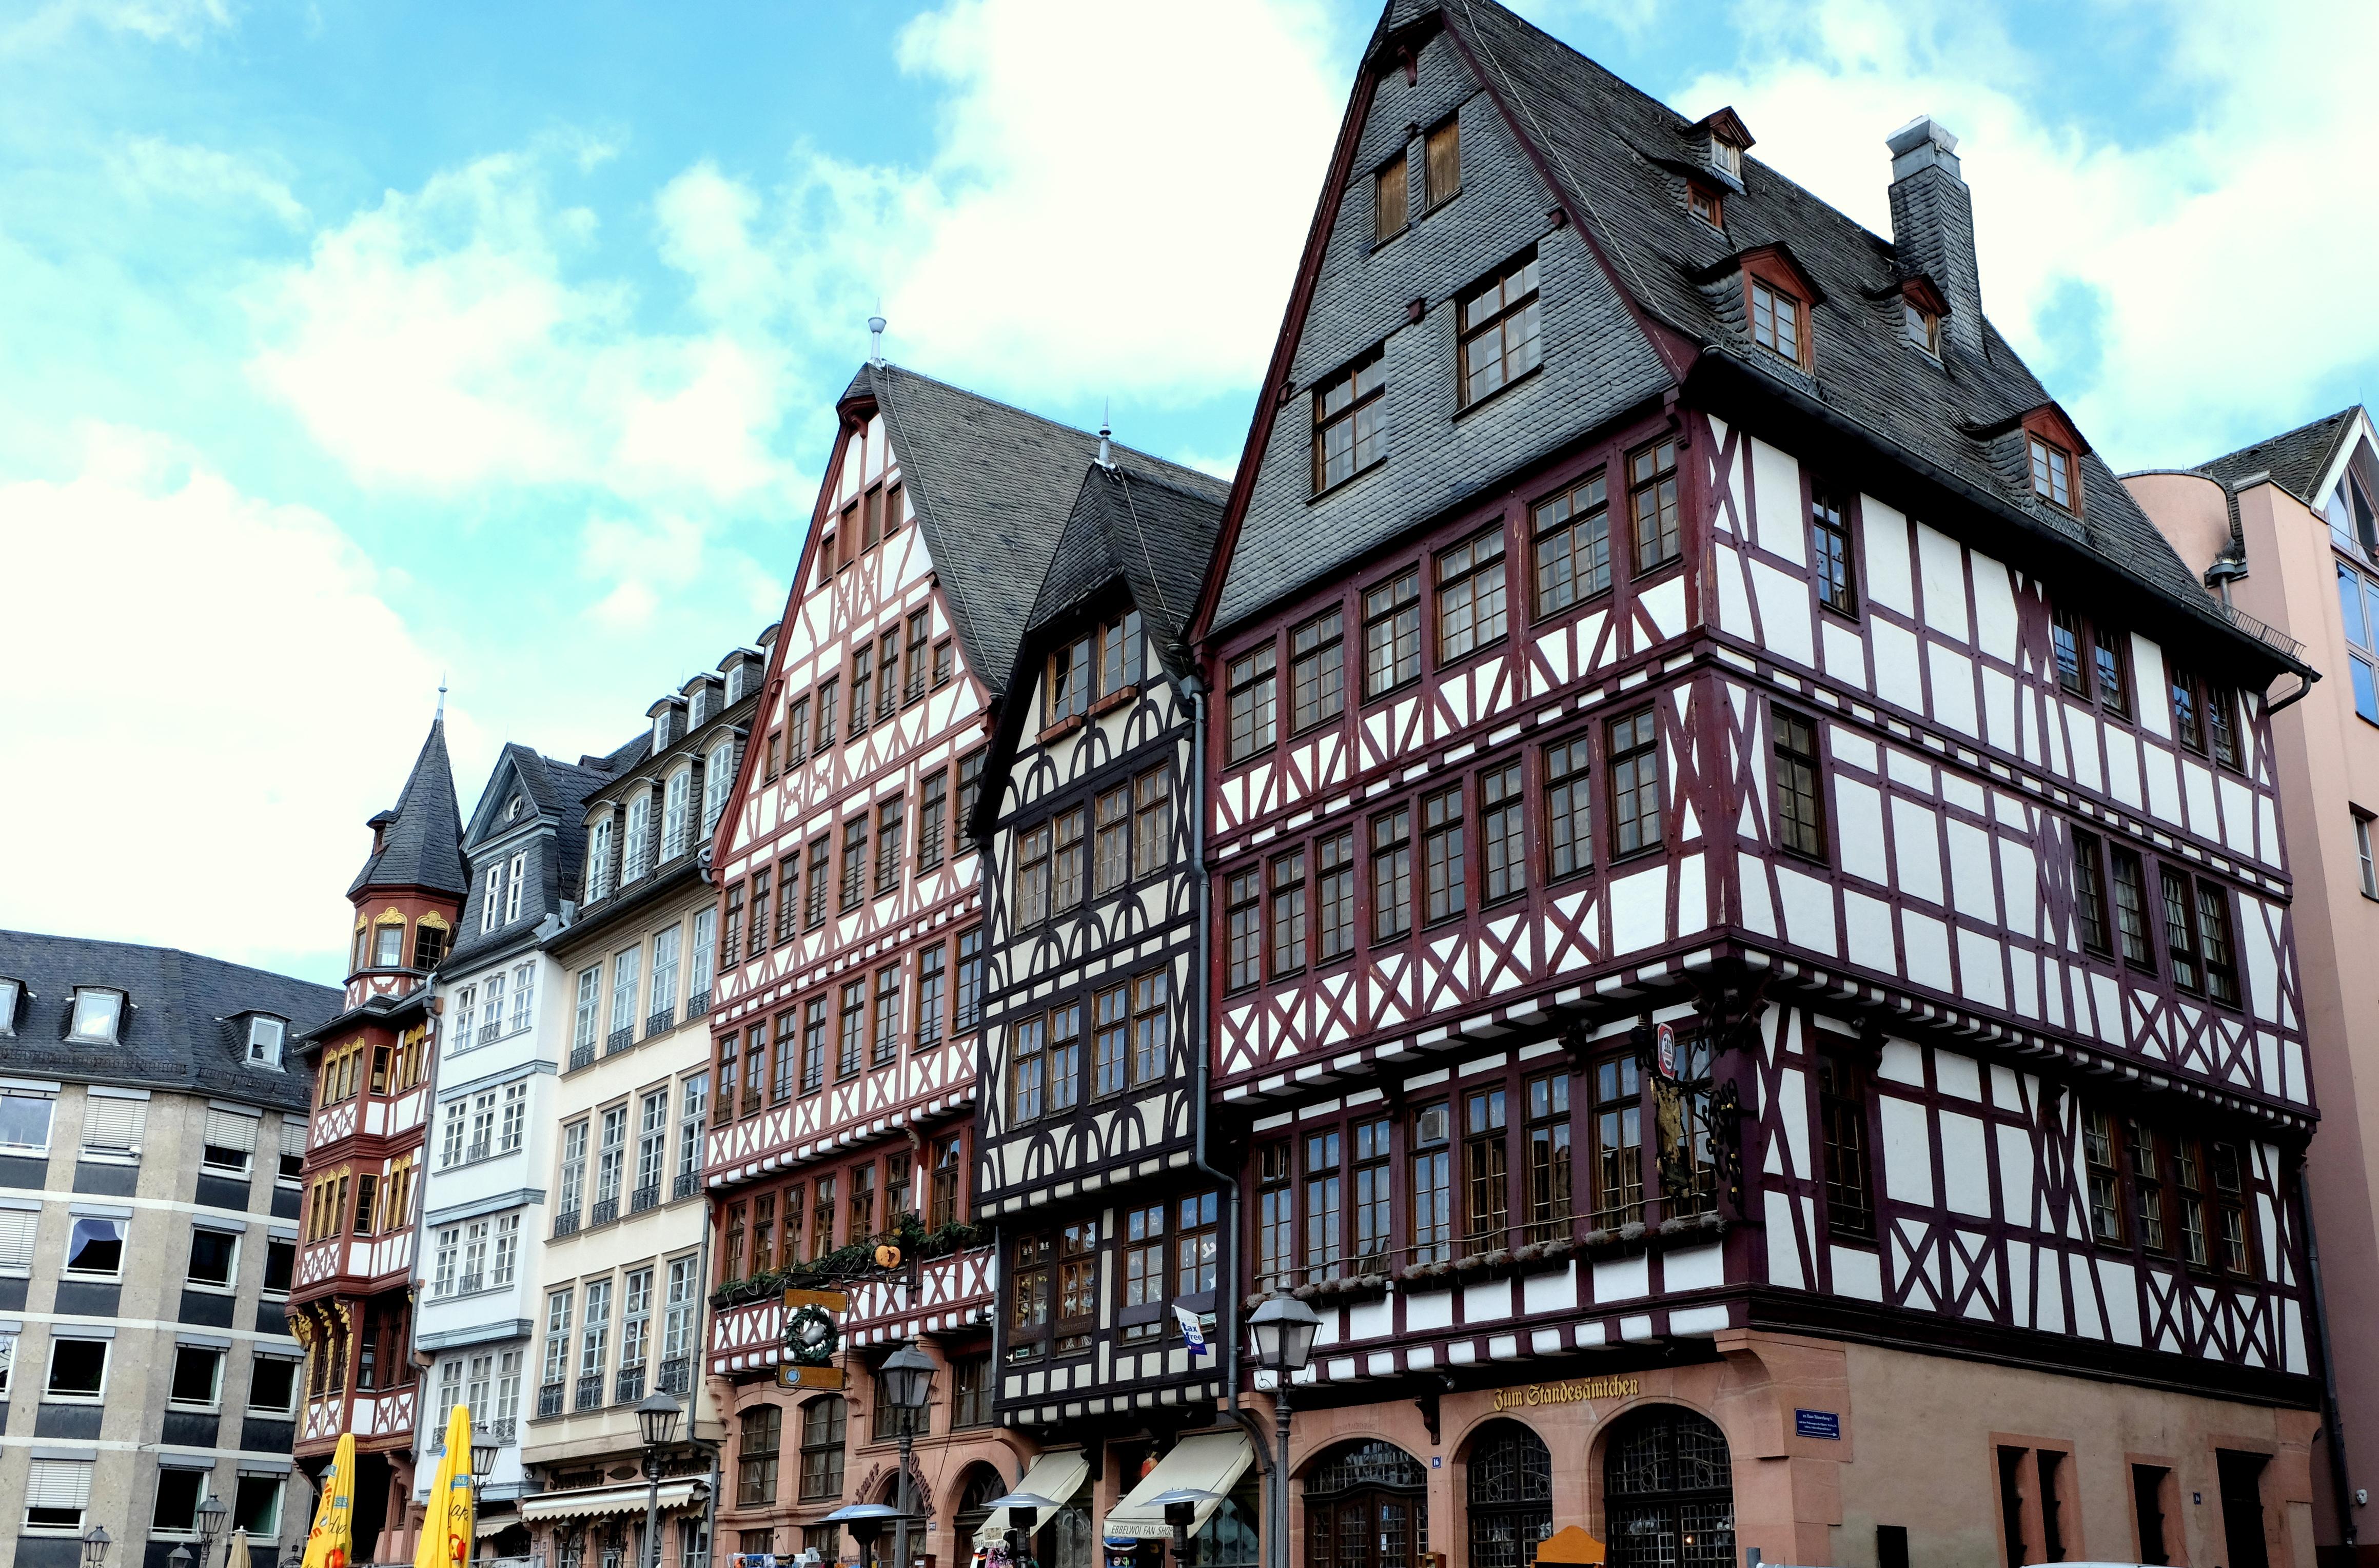 Frankfurt Römer impressions